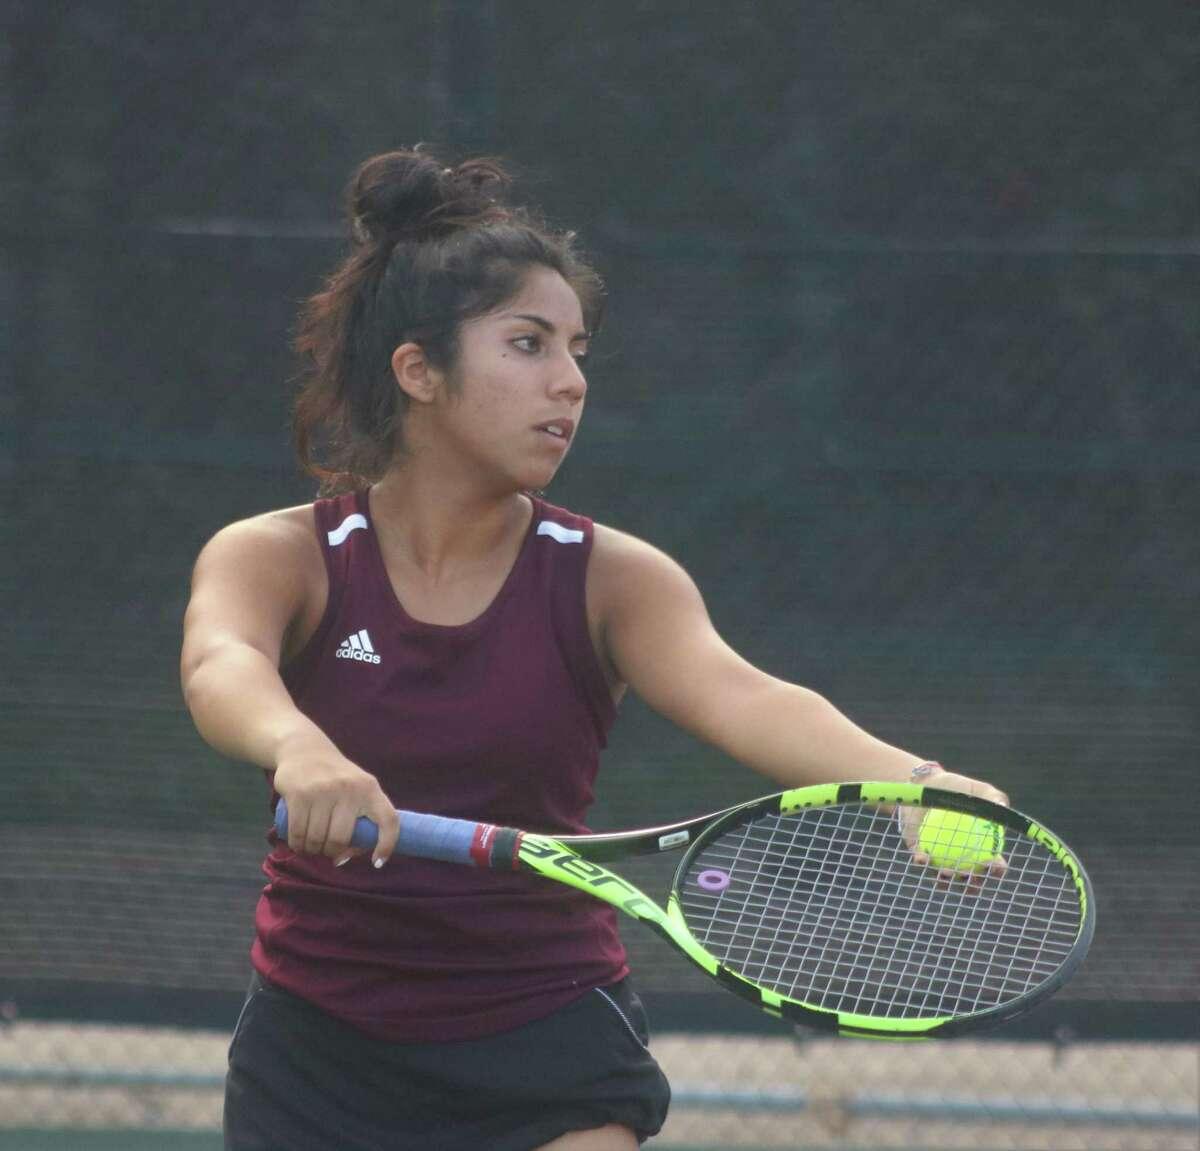 Lourdes Zuniga-Montemayor prepares to serve during her singles match victory against Memorial this week.